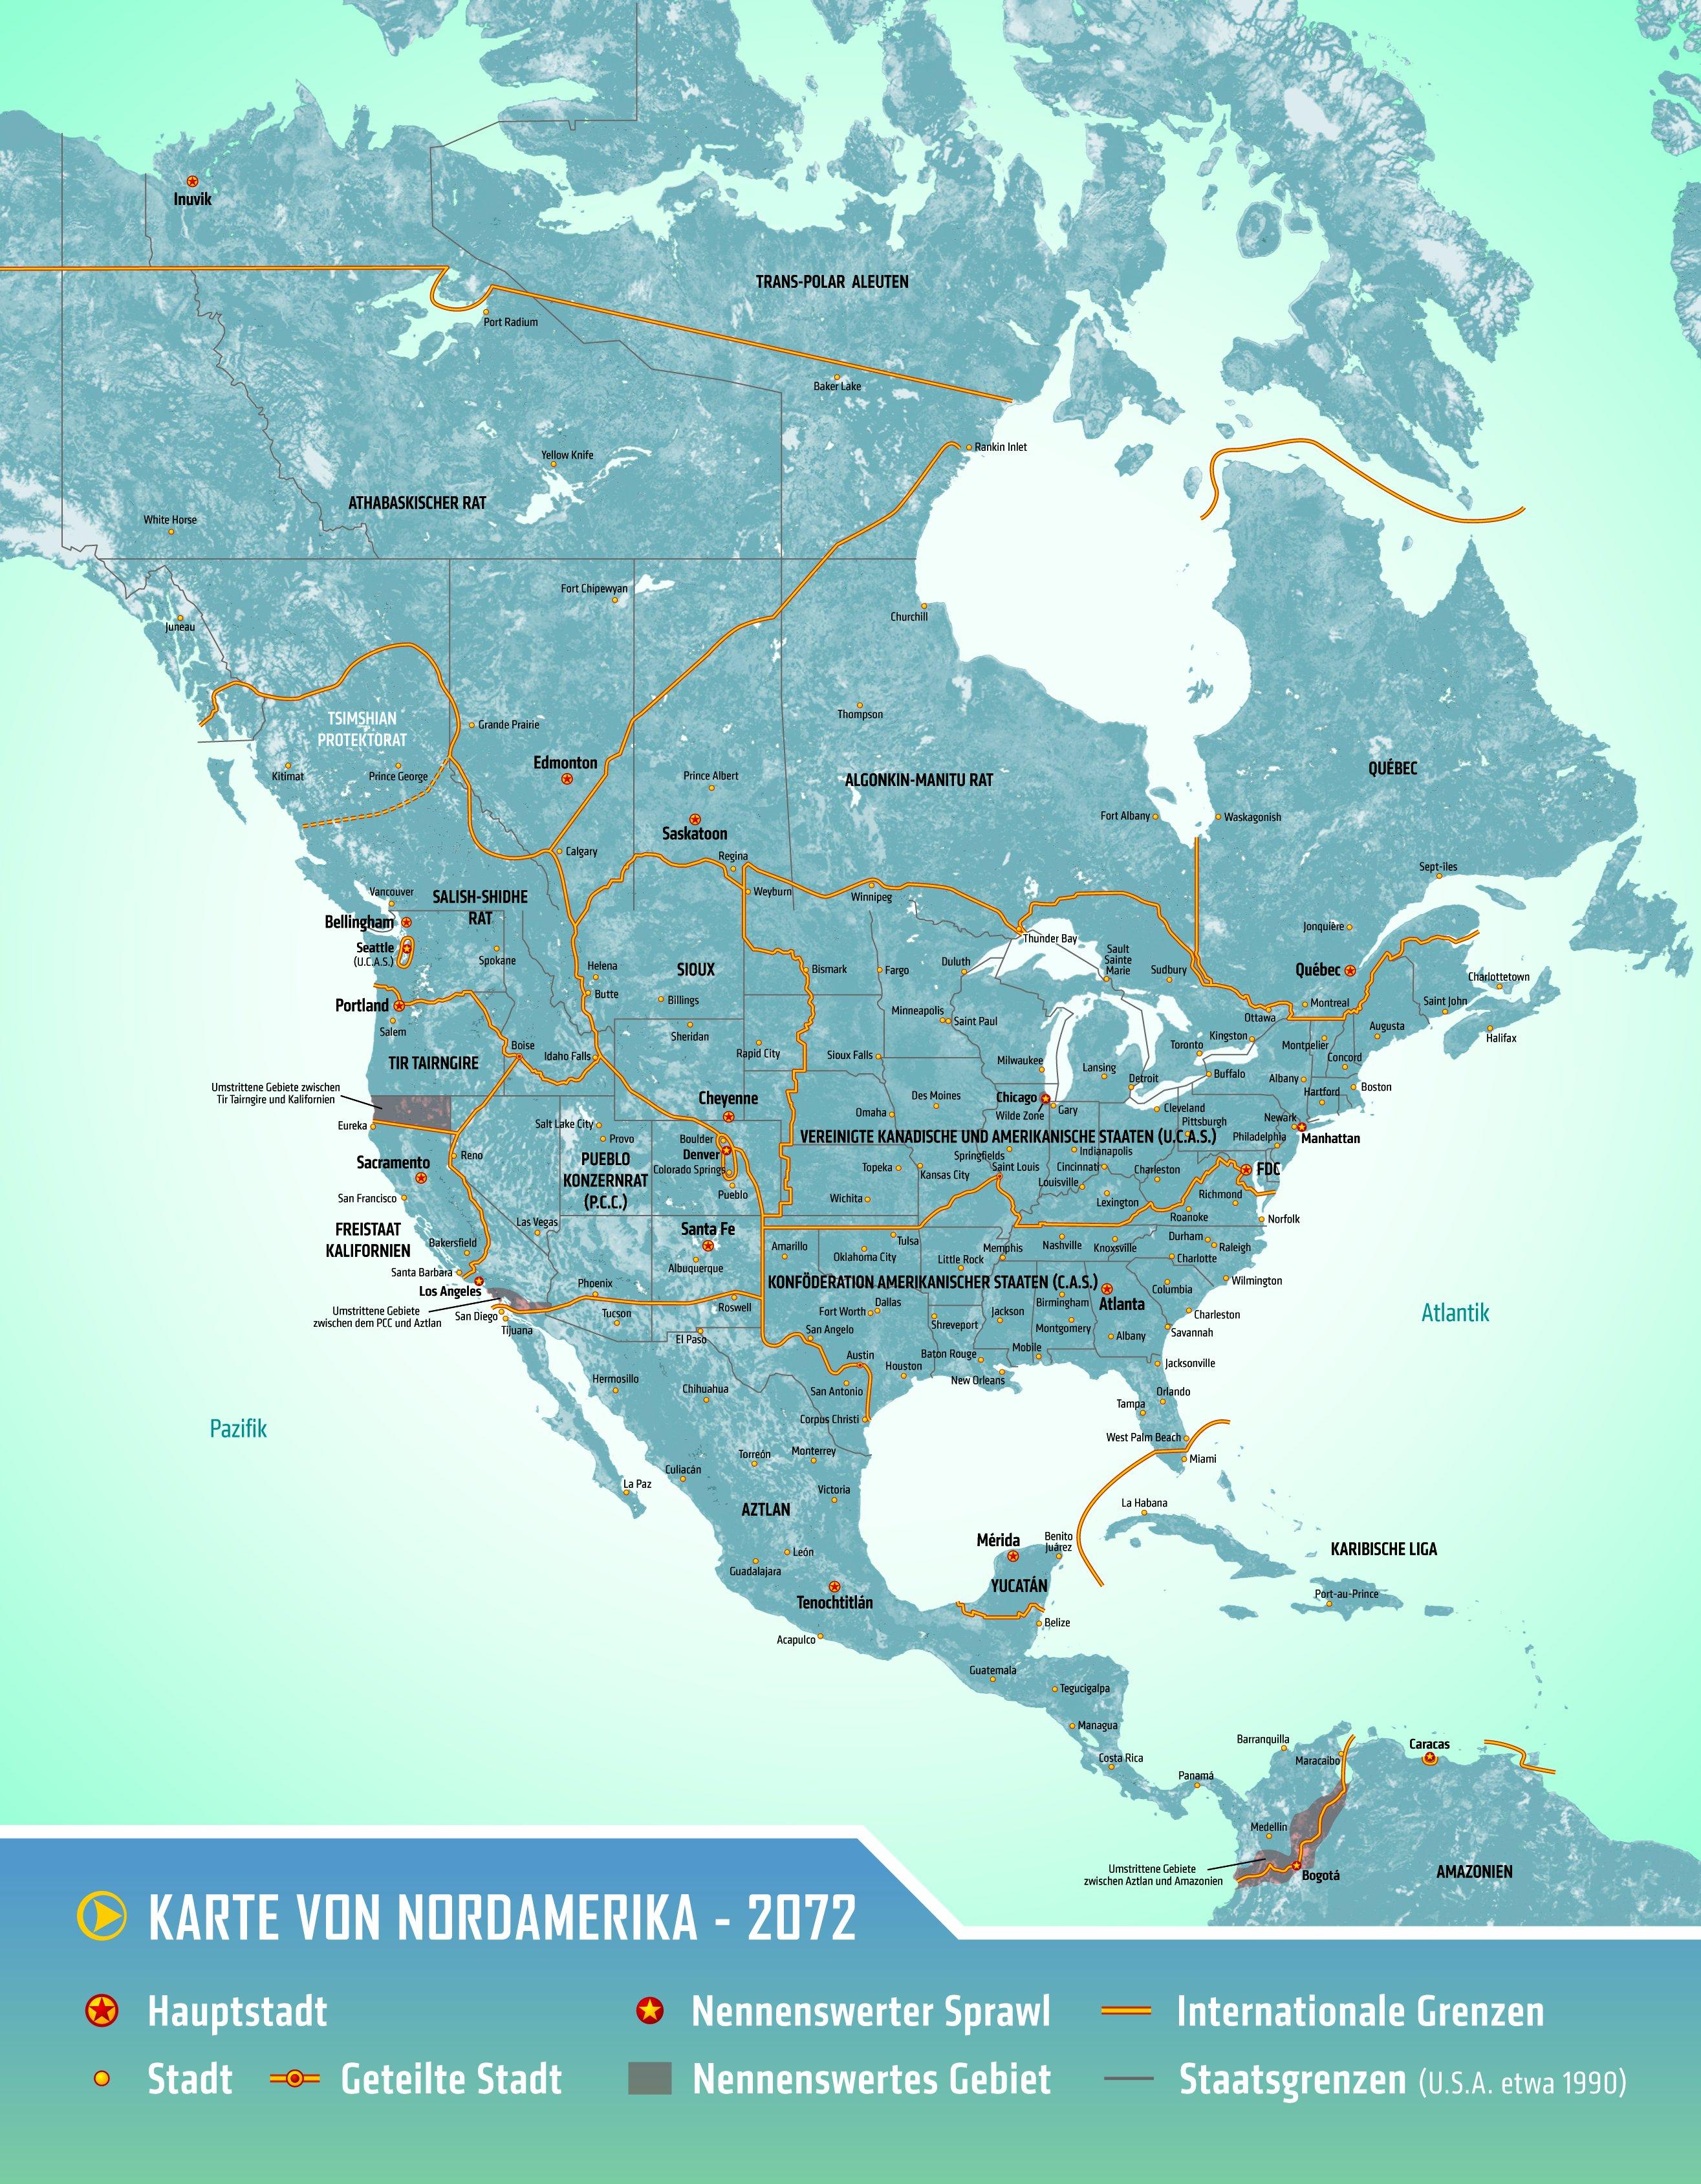 Nord_Amerika_2072.jpg